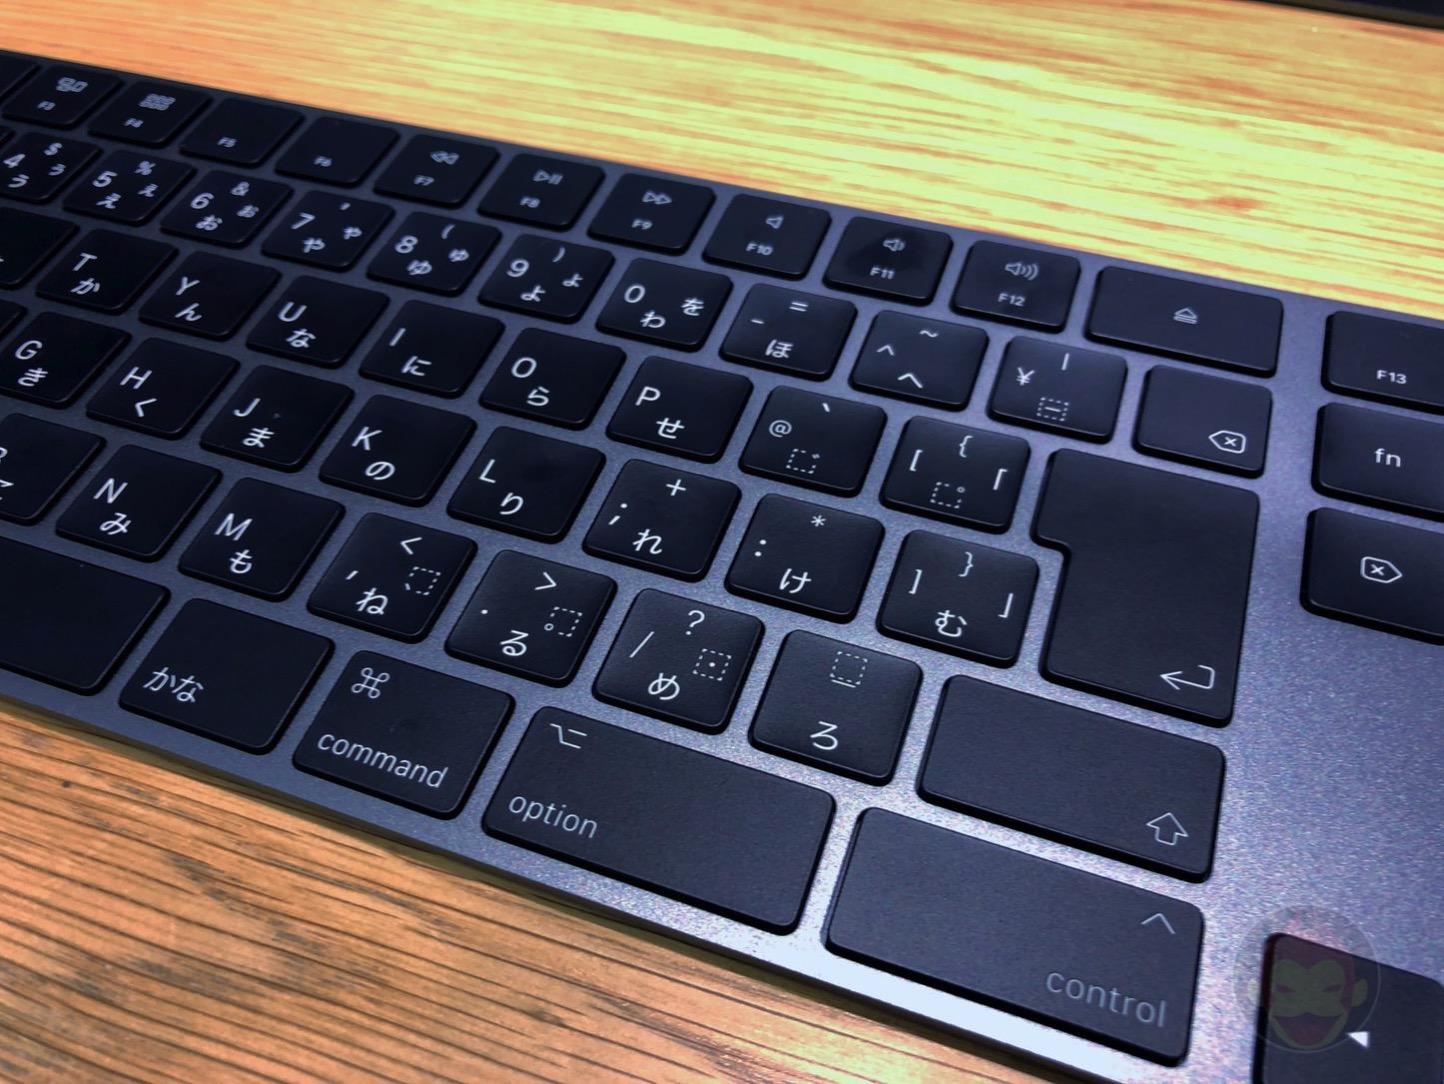 iMac-Pro-Apple-Store-Omotesando-06.jpg